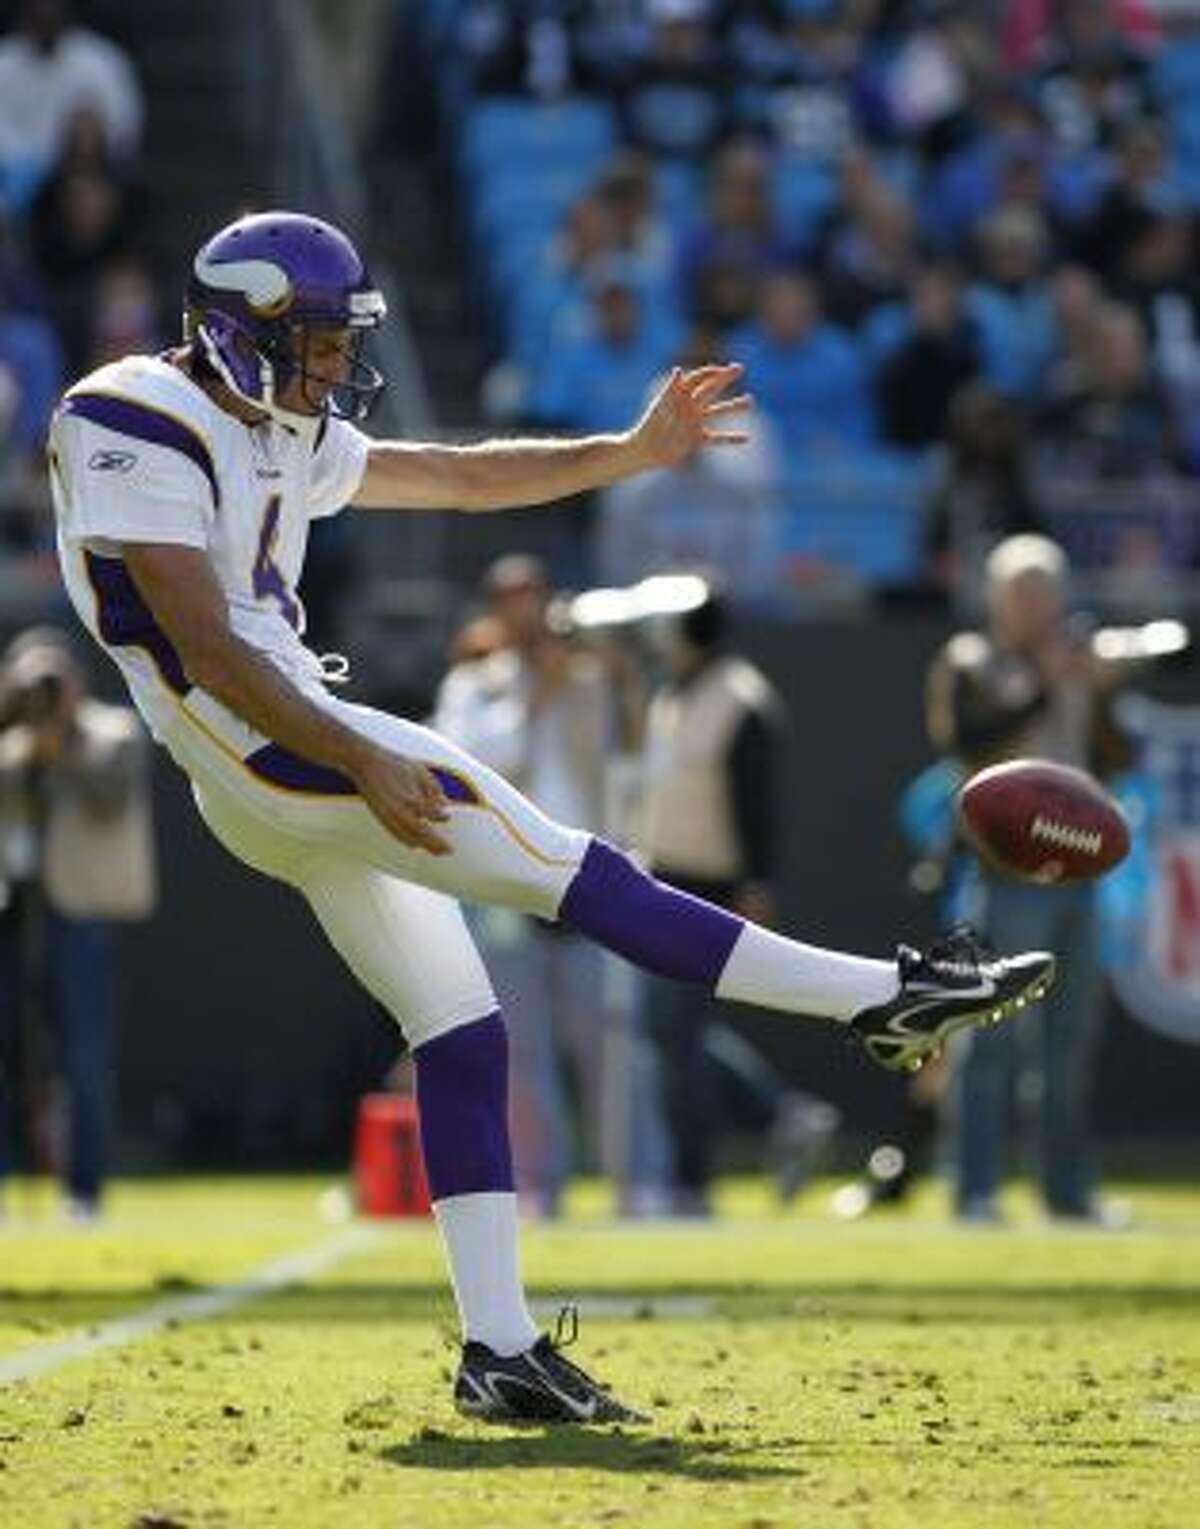 Minnesota Vikings' Chris Kluwe punts to the Carolina Panthers during an NFL football game in Charlotte, N.C.